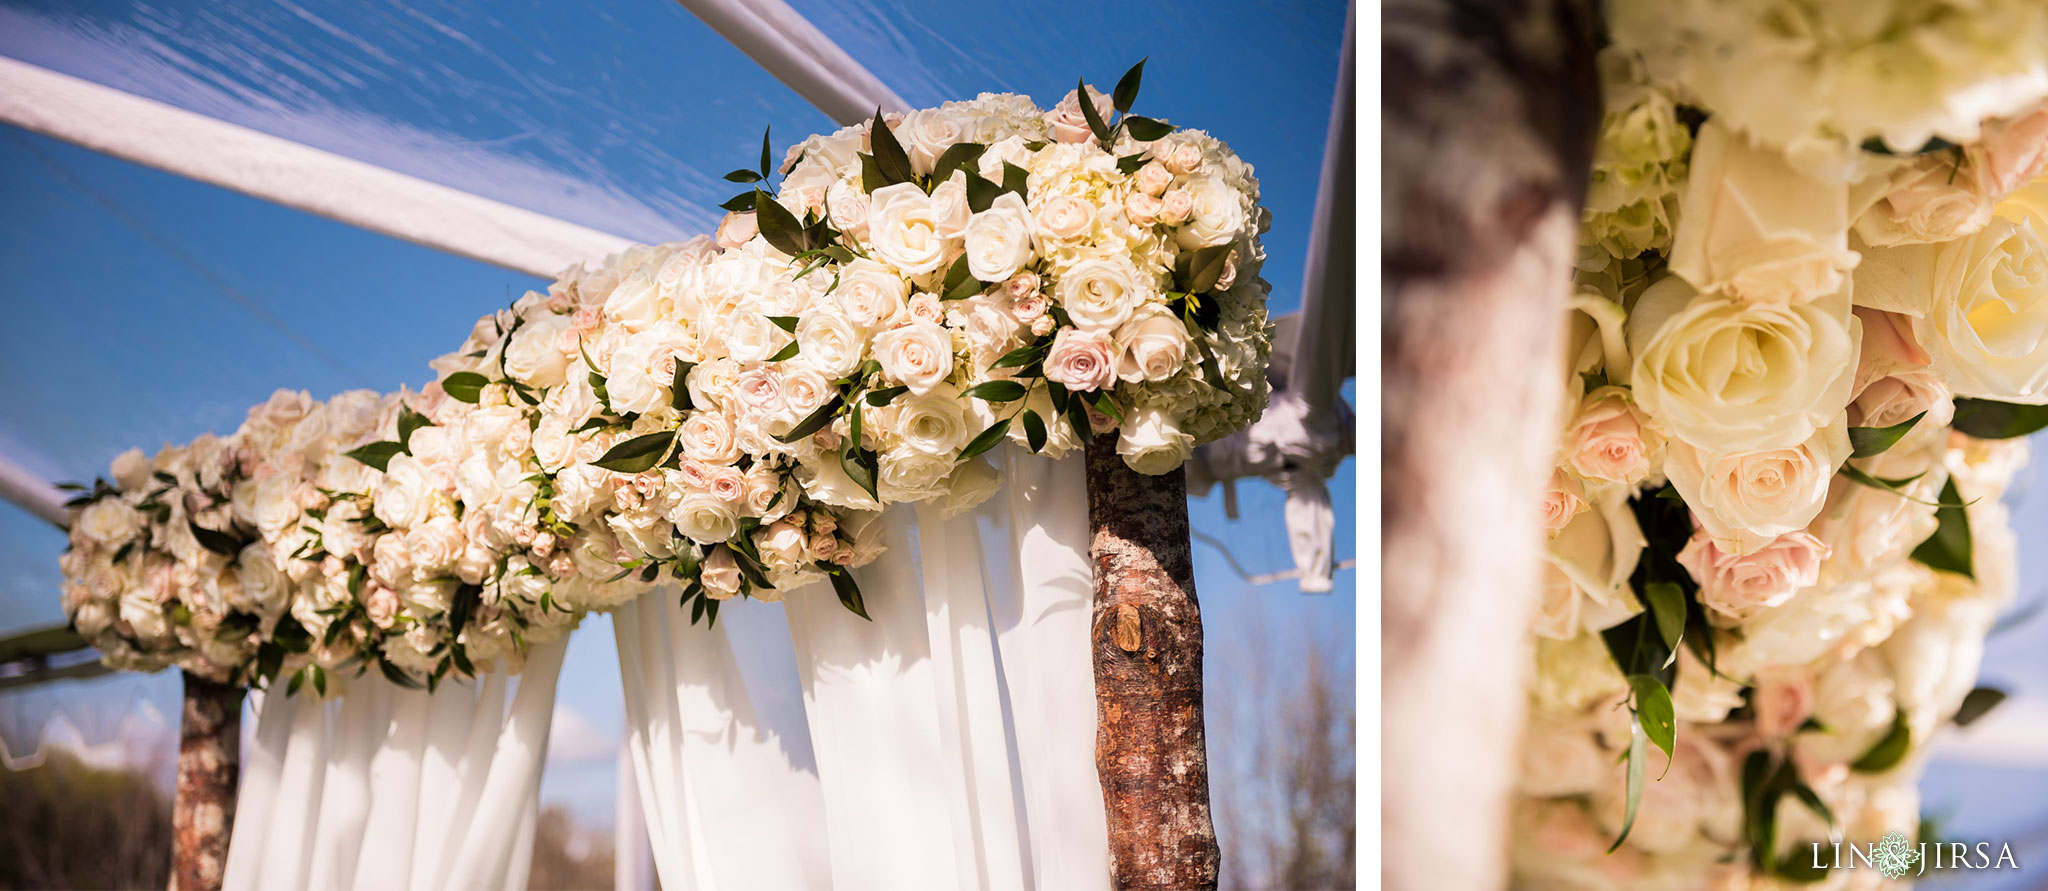 19 sherwood country club ventura county wedding ceremony photography